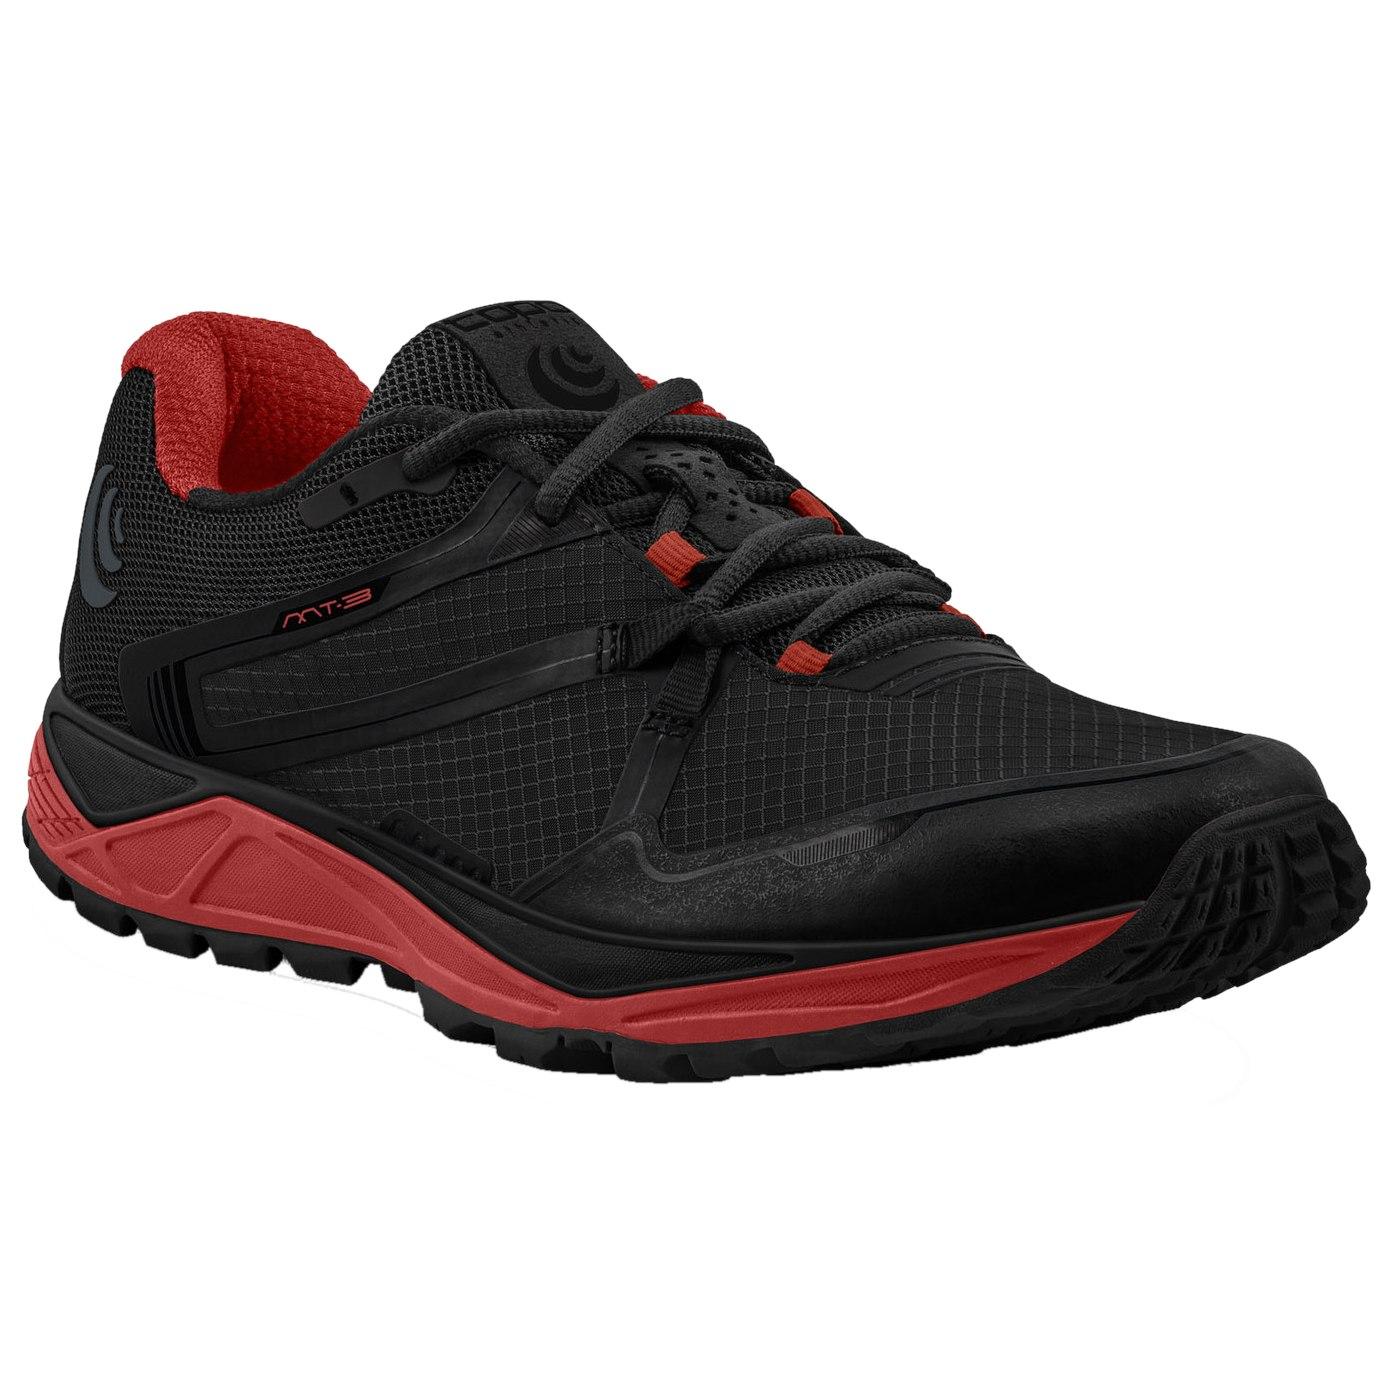 Topo Athletic MT-3 Trail Laufschuhe - schwarz/rot